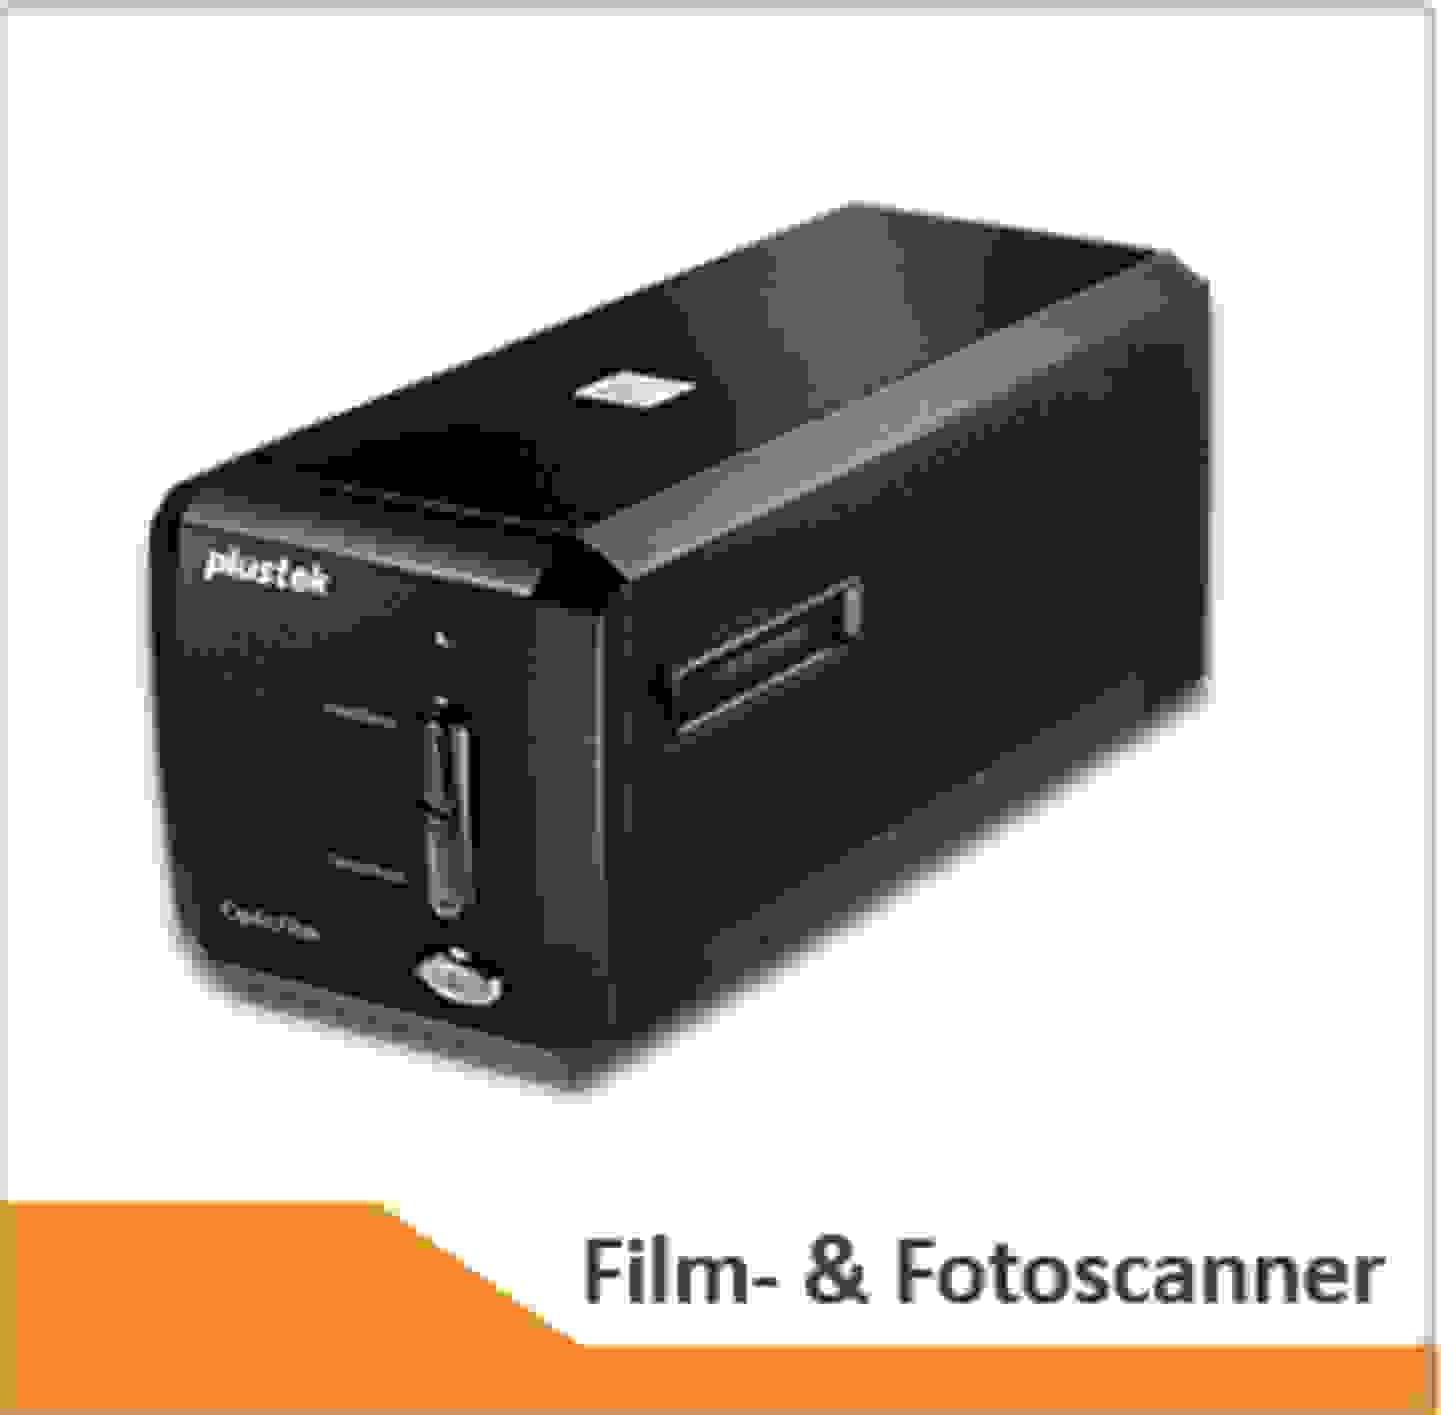 Film- & Fotoscanner